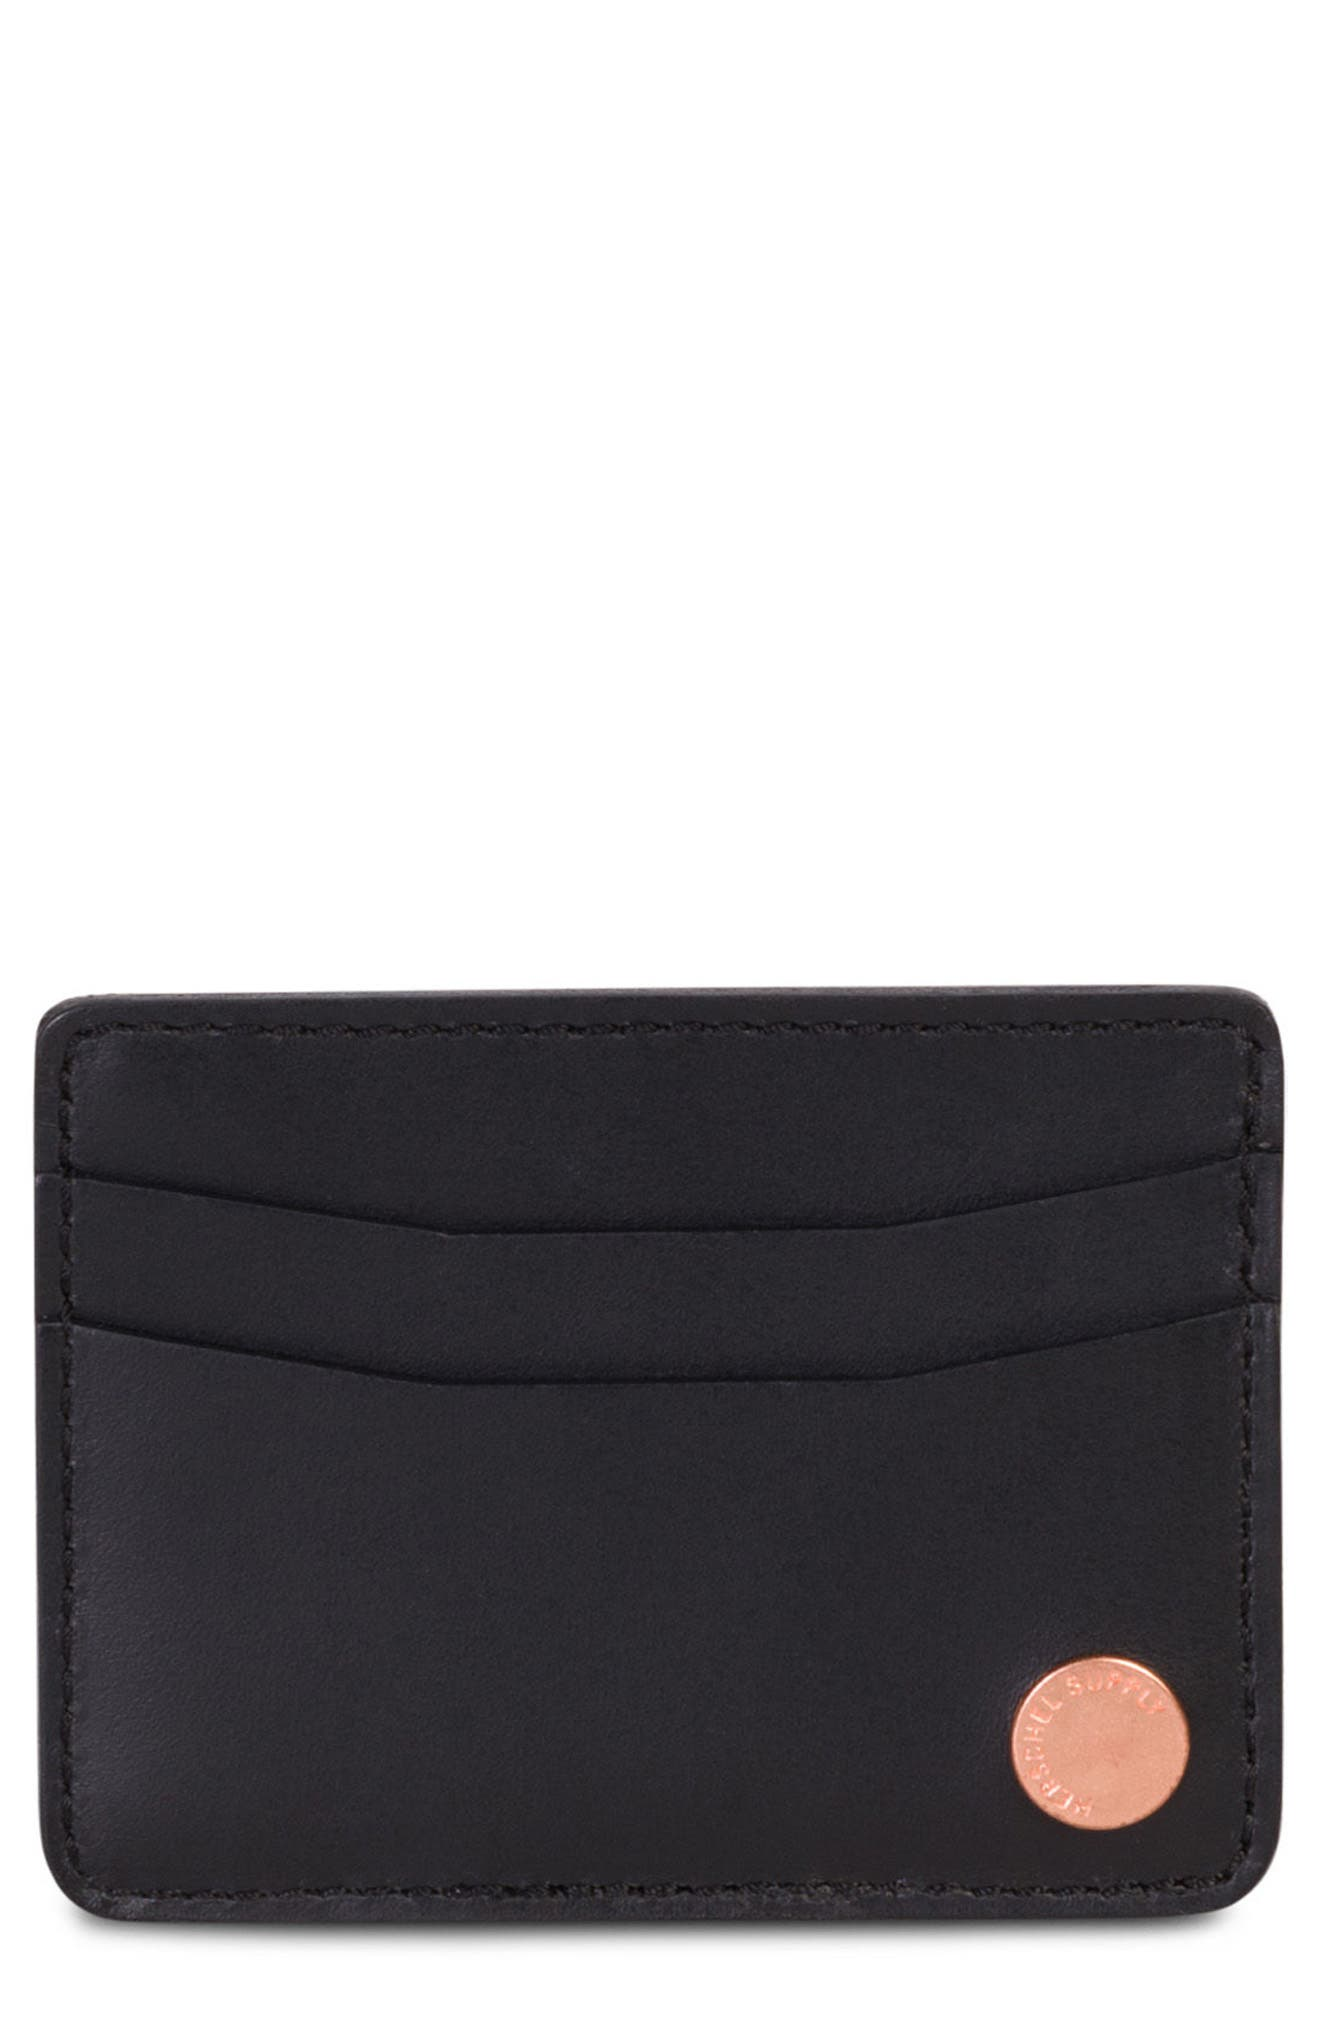 Ace Leather Card Case,                             Main thumbnail 1, color,                             001